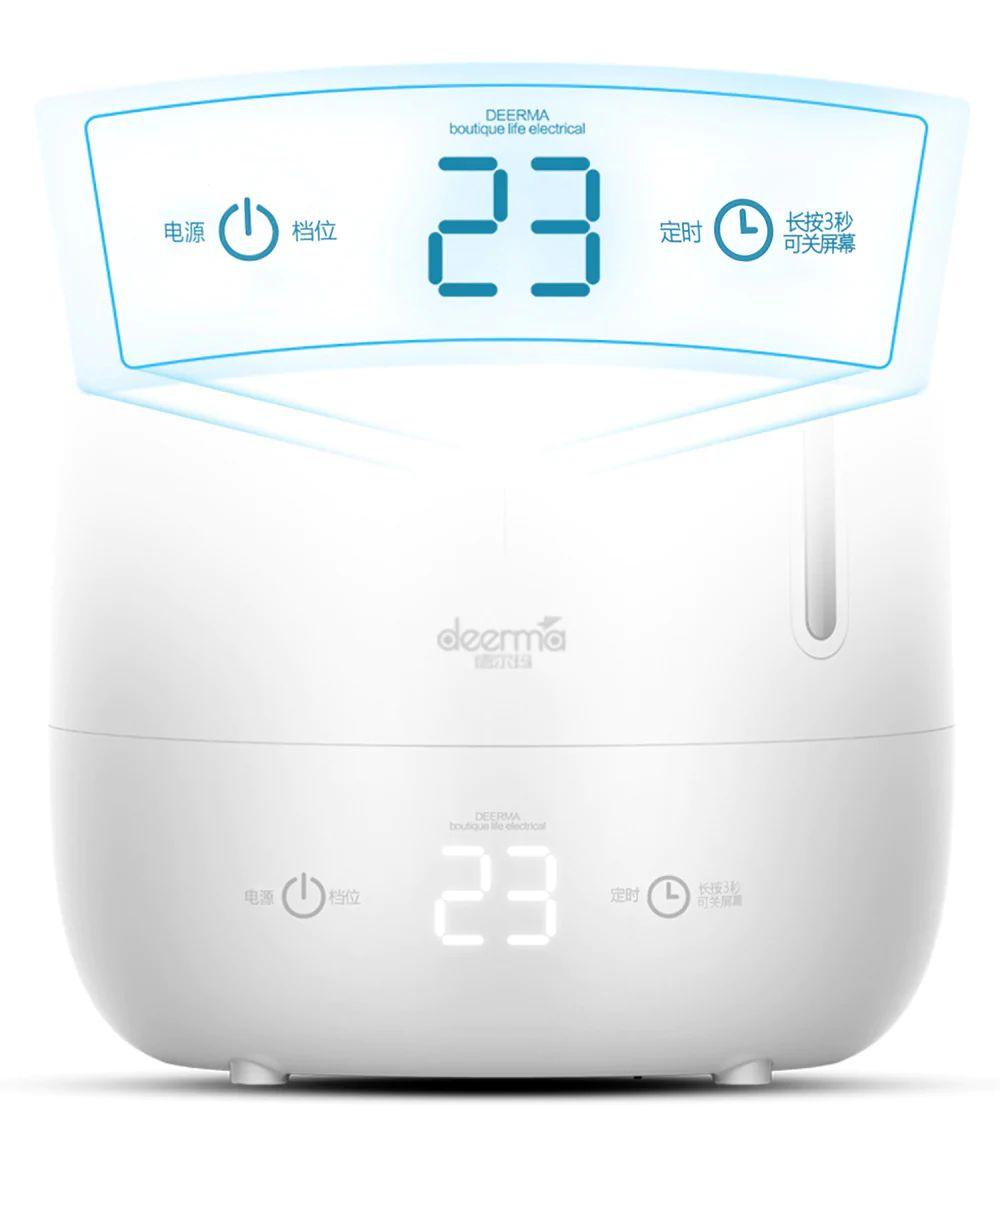 Xiaomi Deerma Dem F600 Household Humidifier Purifying Mist Maker 5l (7)